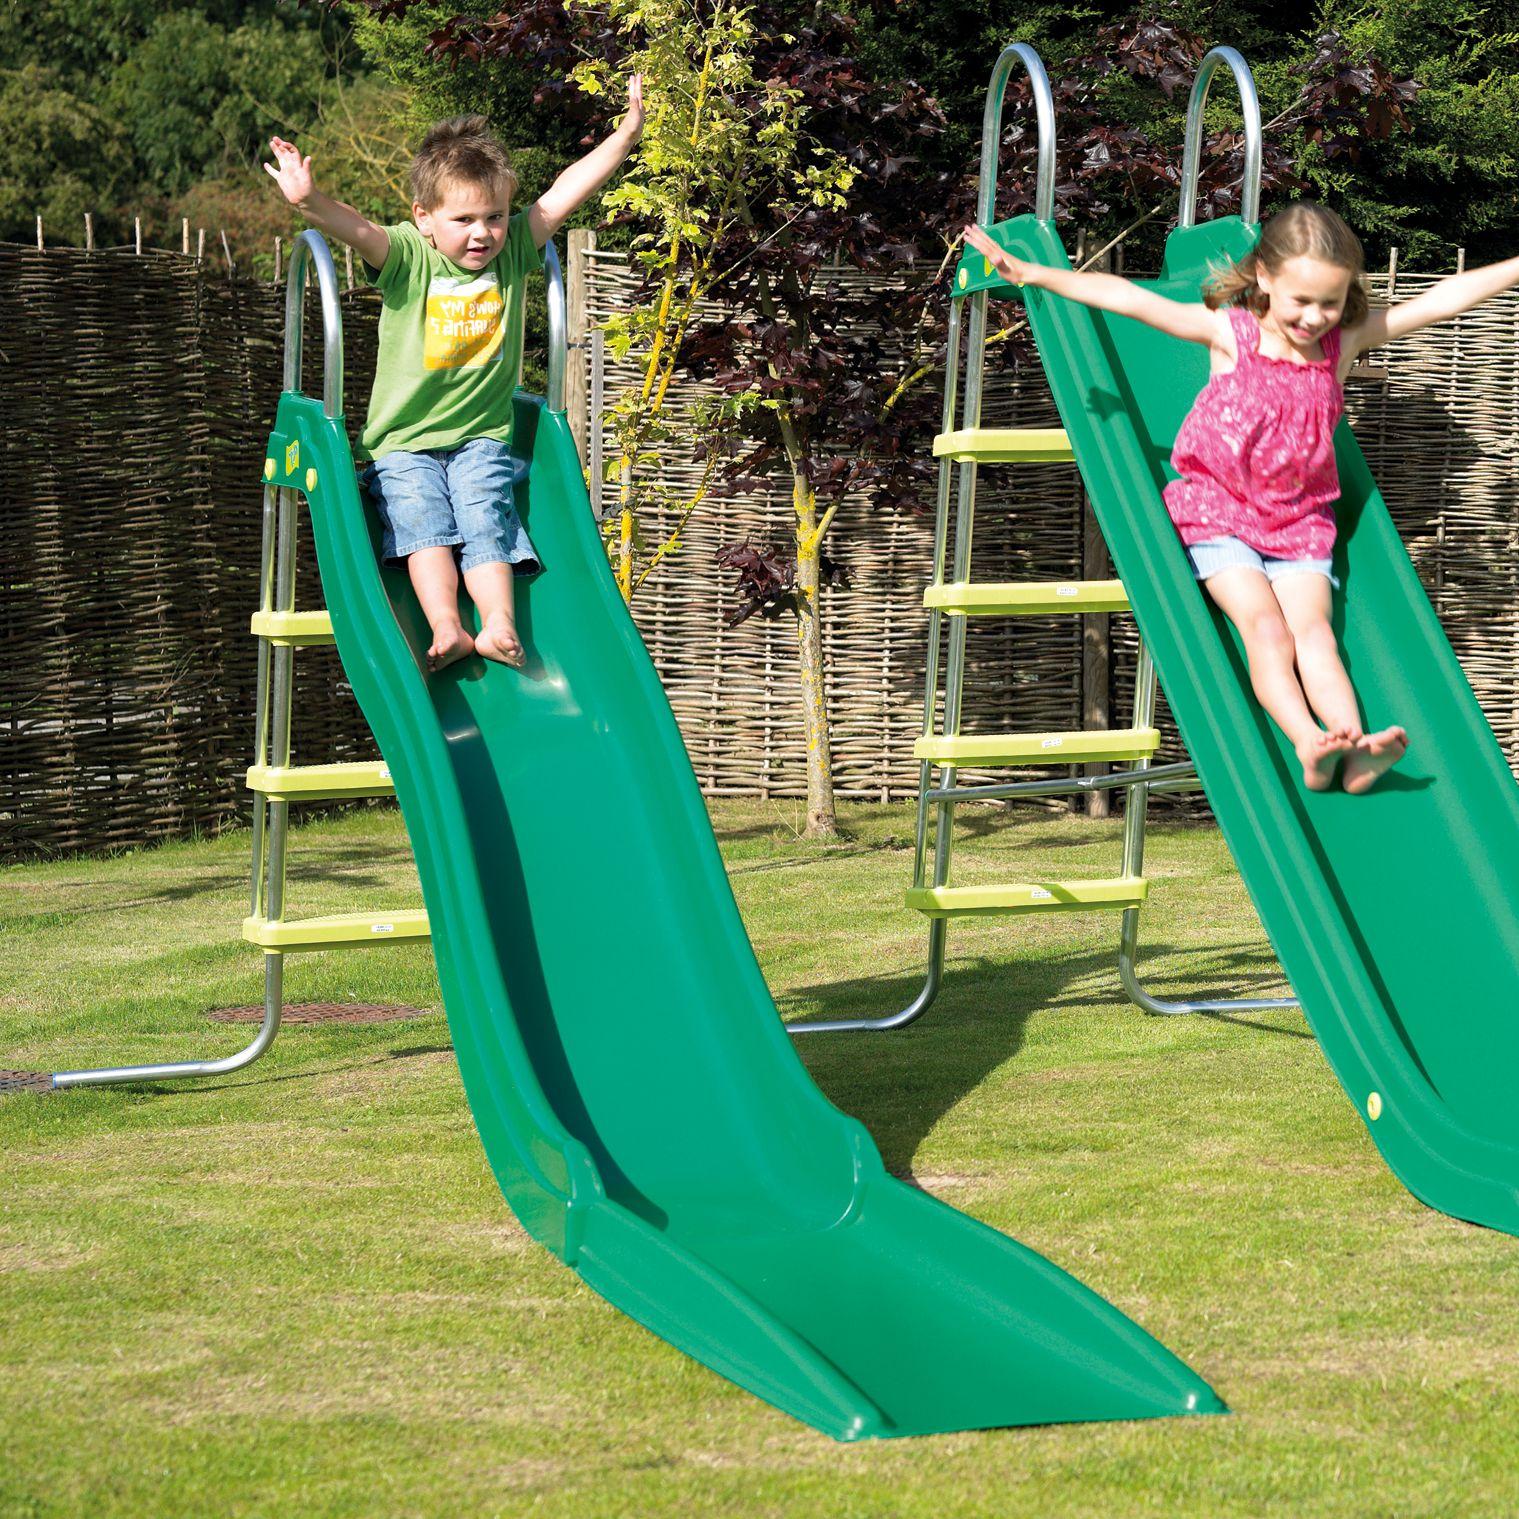 TP969 CrazyWavy Slide Body, 2.5m, Green